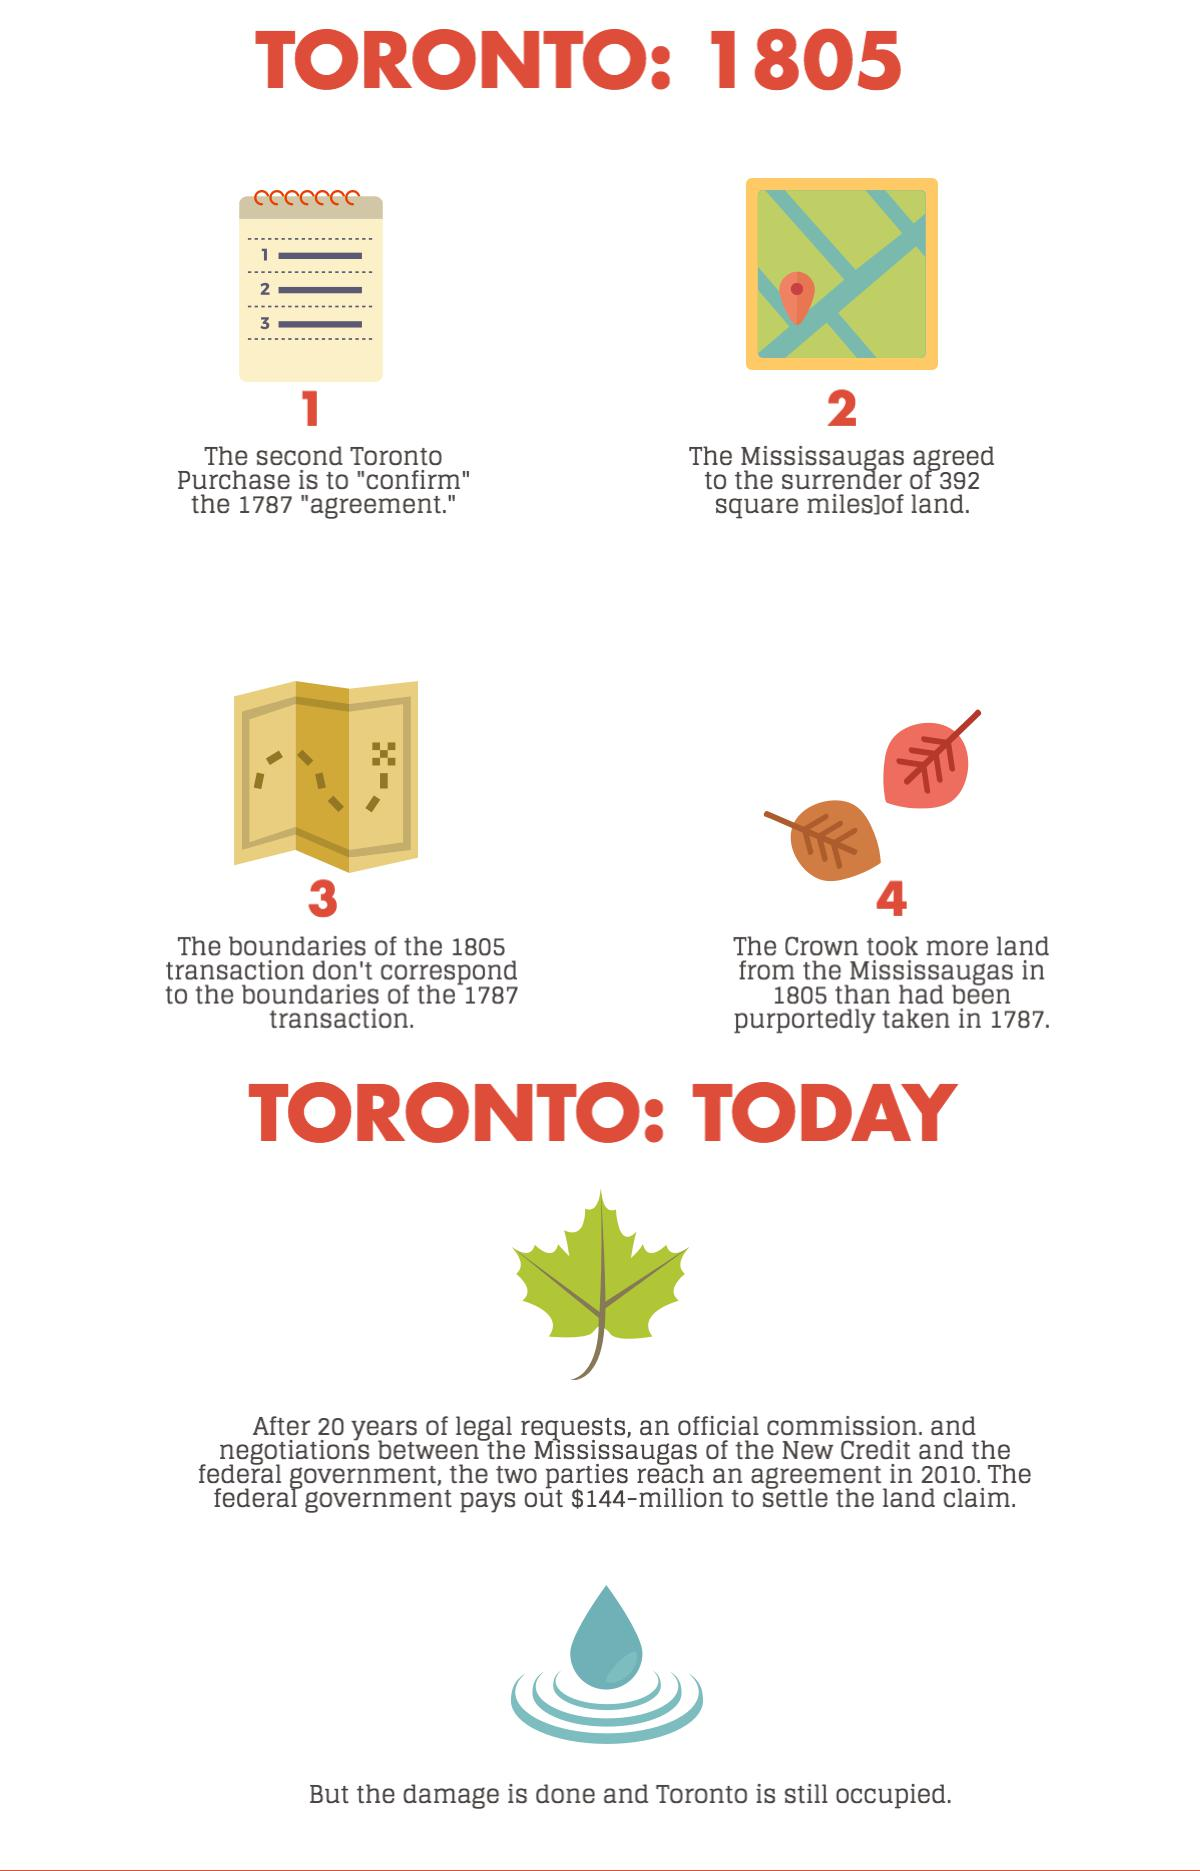 Graphic on Toronto: 1805 vs Toronto: today